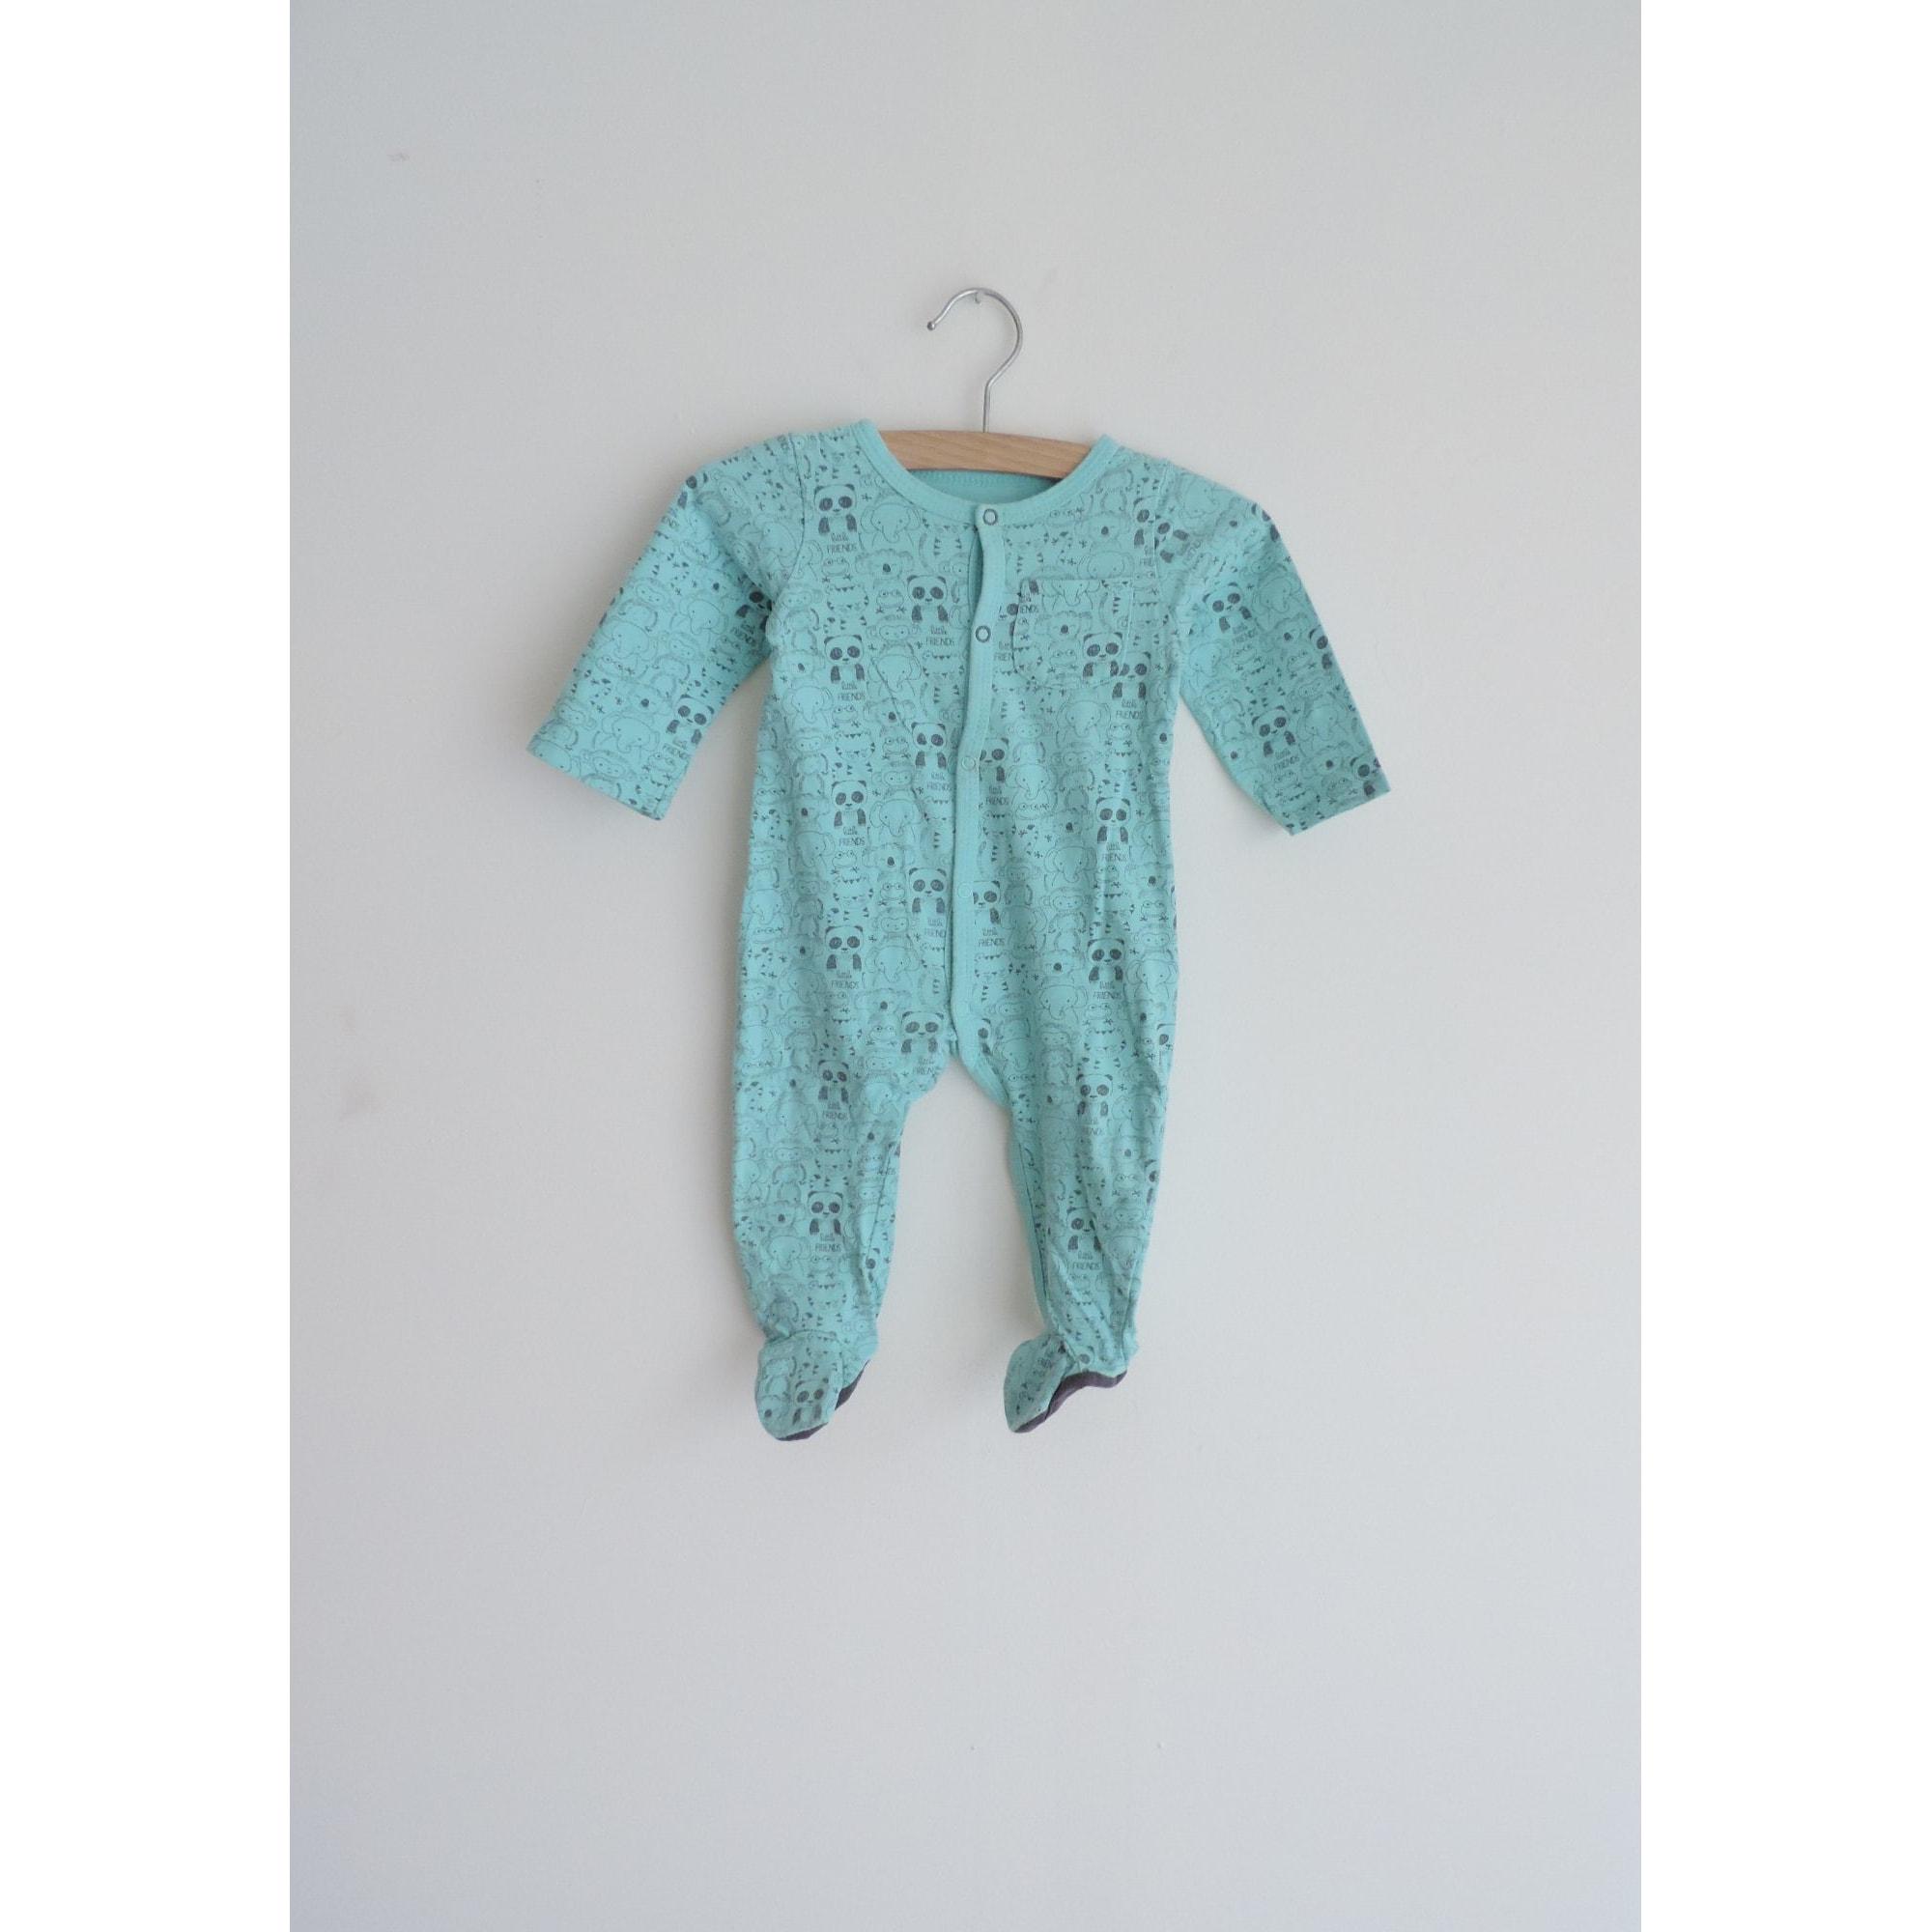 Grenouillère, babygros IN EXTENSO Bleu, bleu marine, bleu turquoise